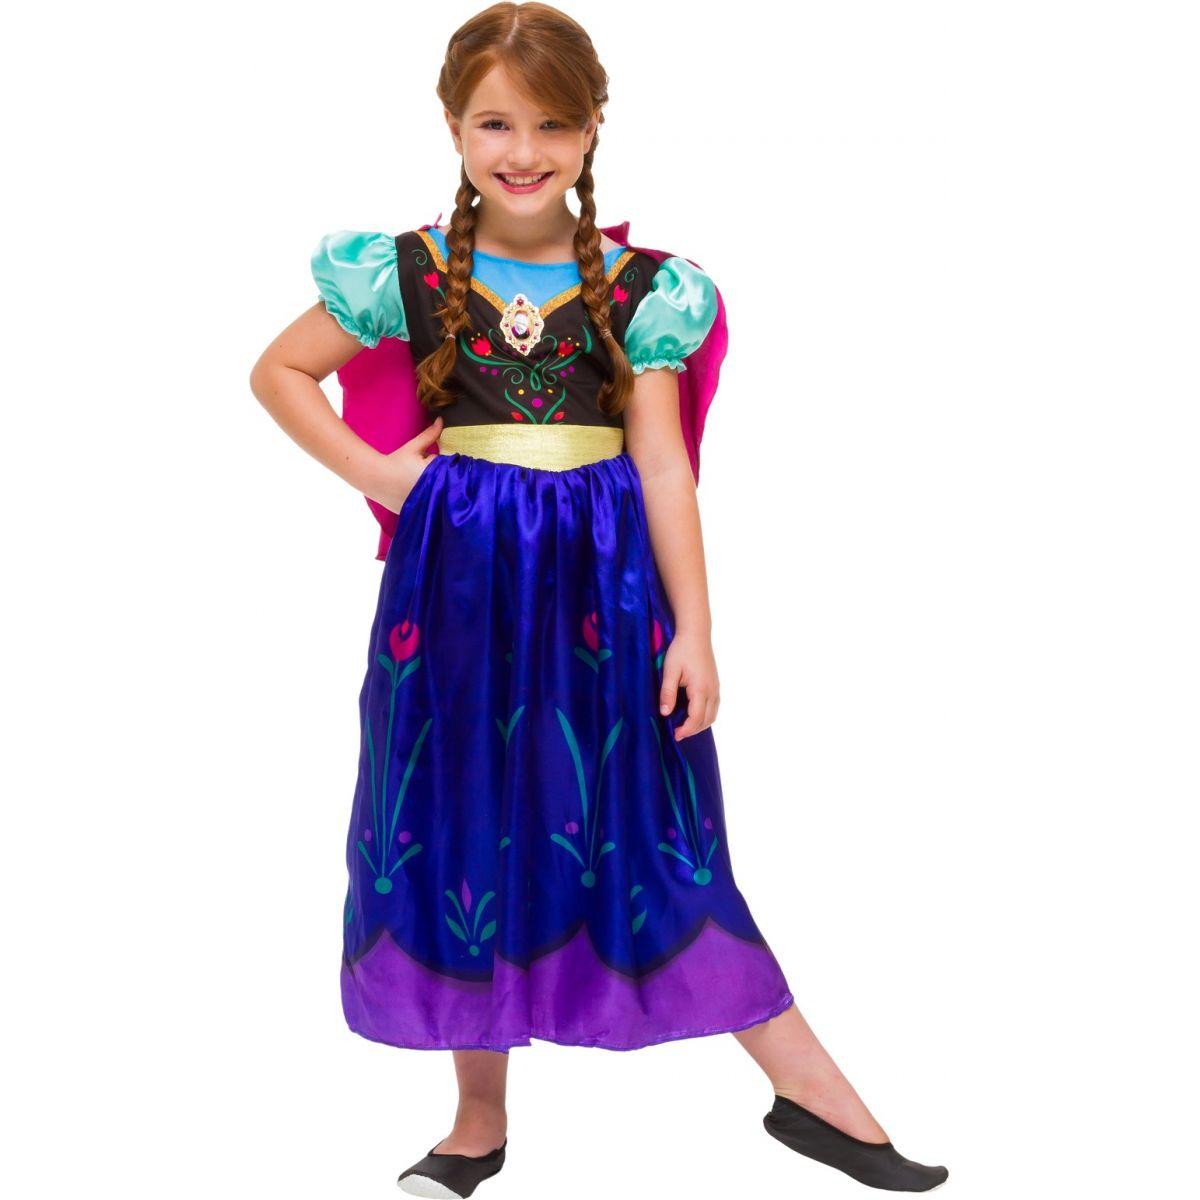 Fantasia Anna Infantil Luxo